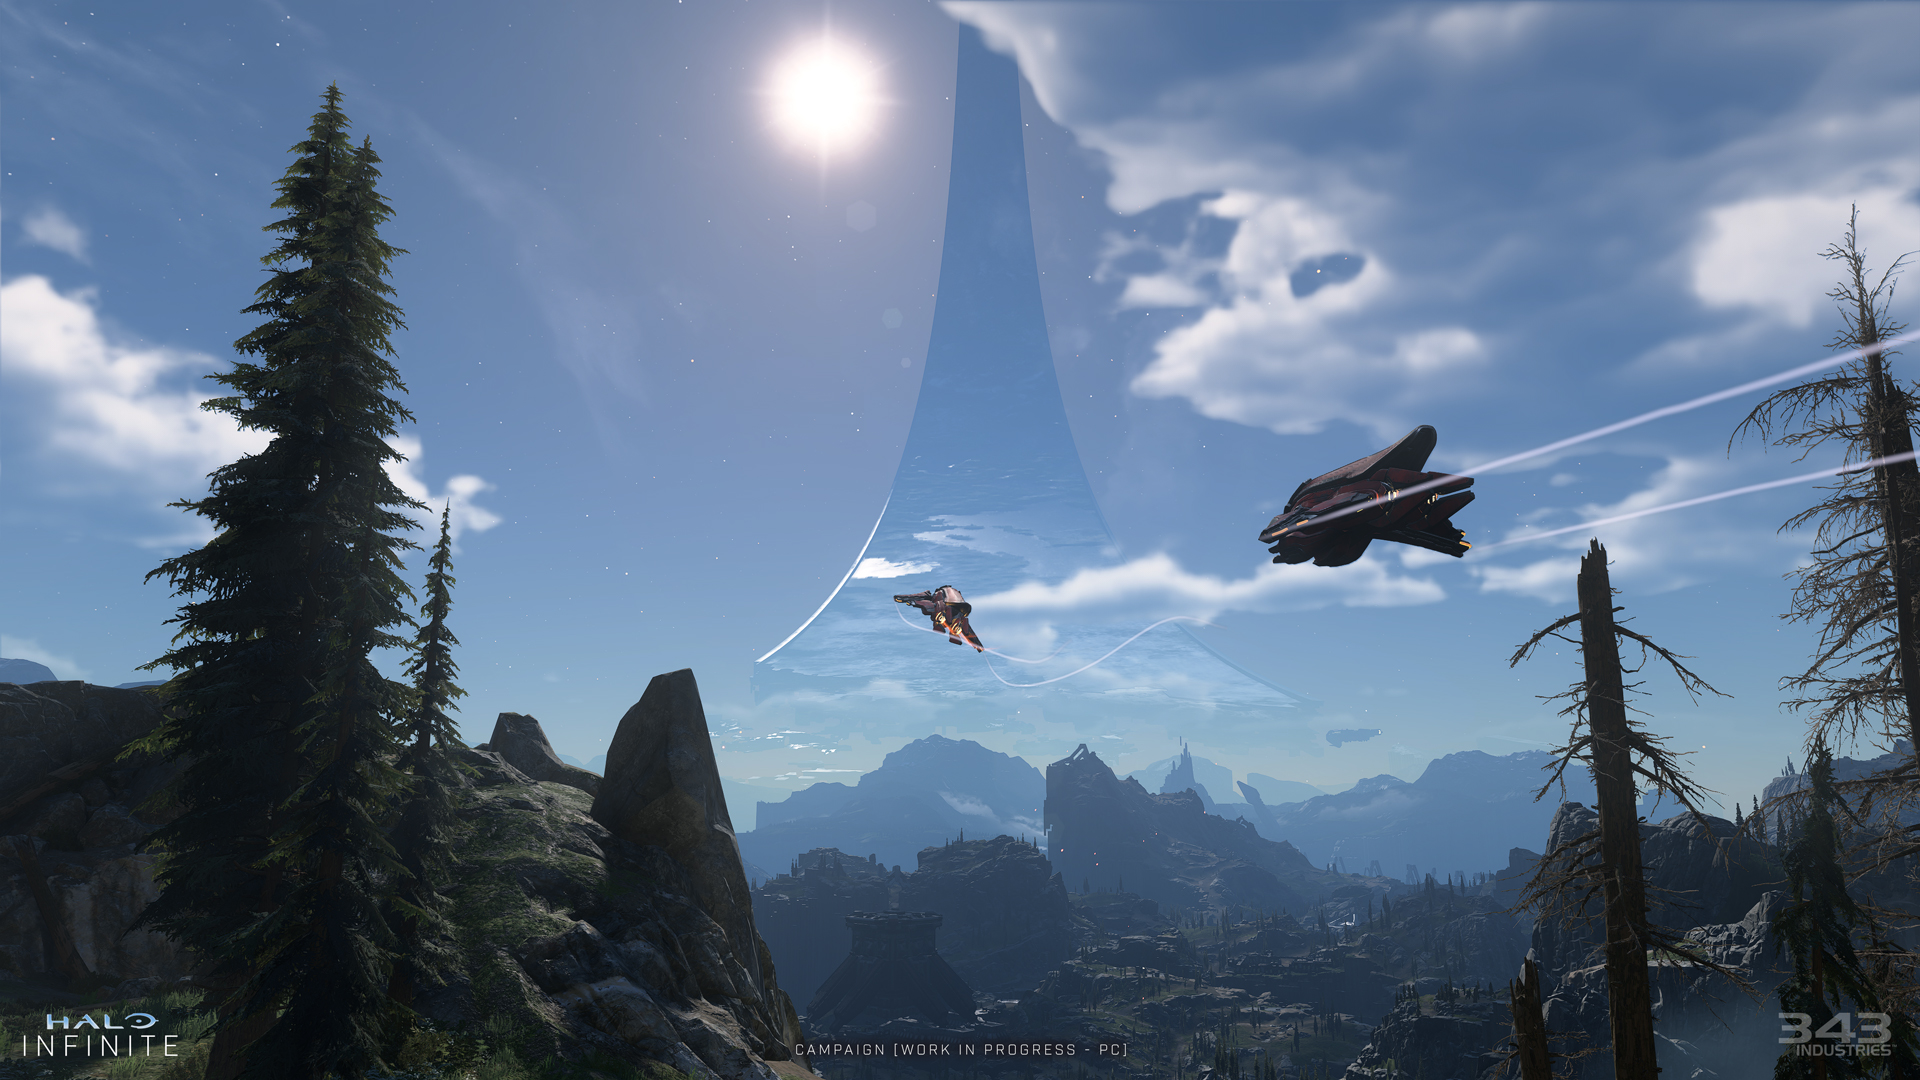 In-game screenshot of two Banshees flying over Zeta Halo.